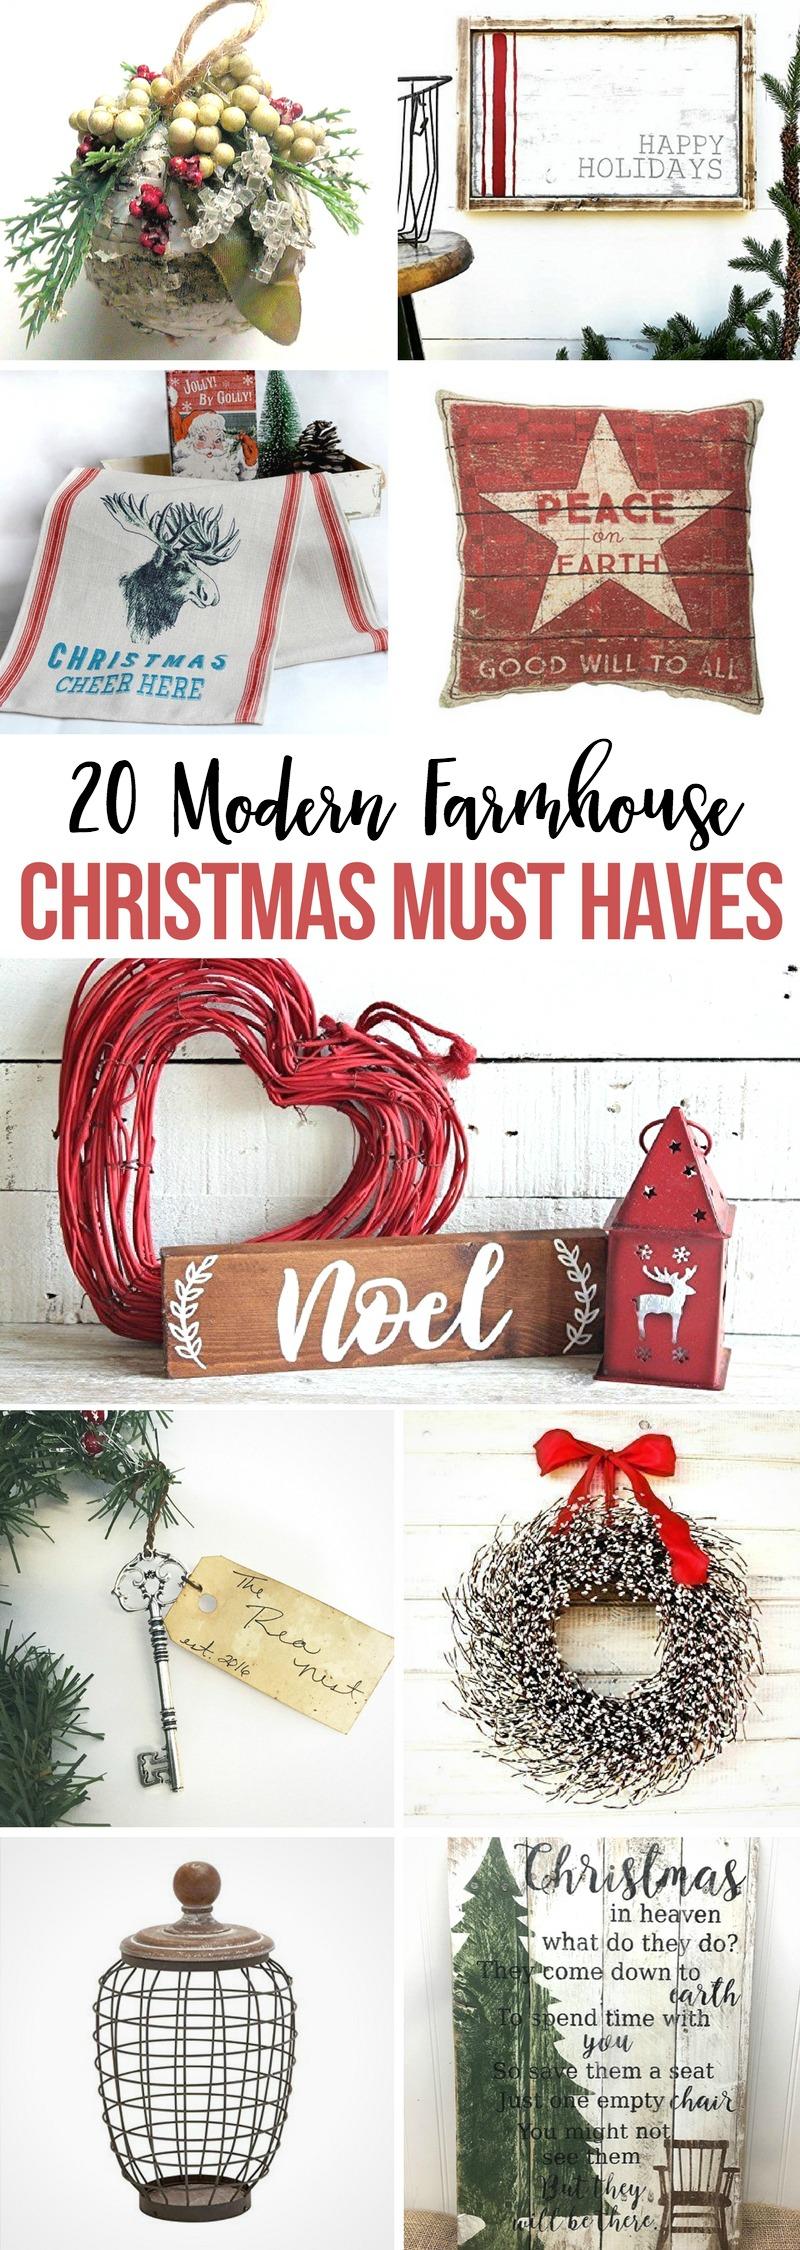 20 Modern Farmhouse Christmas Must Haves